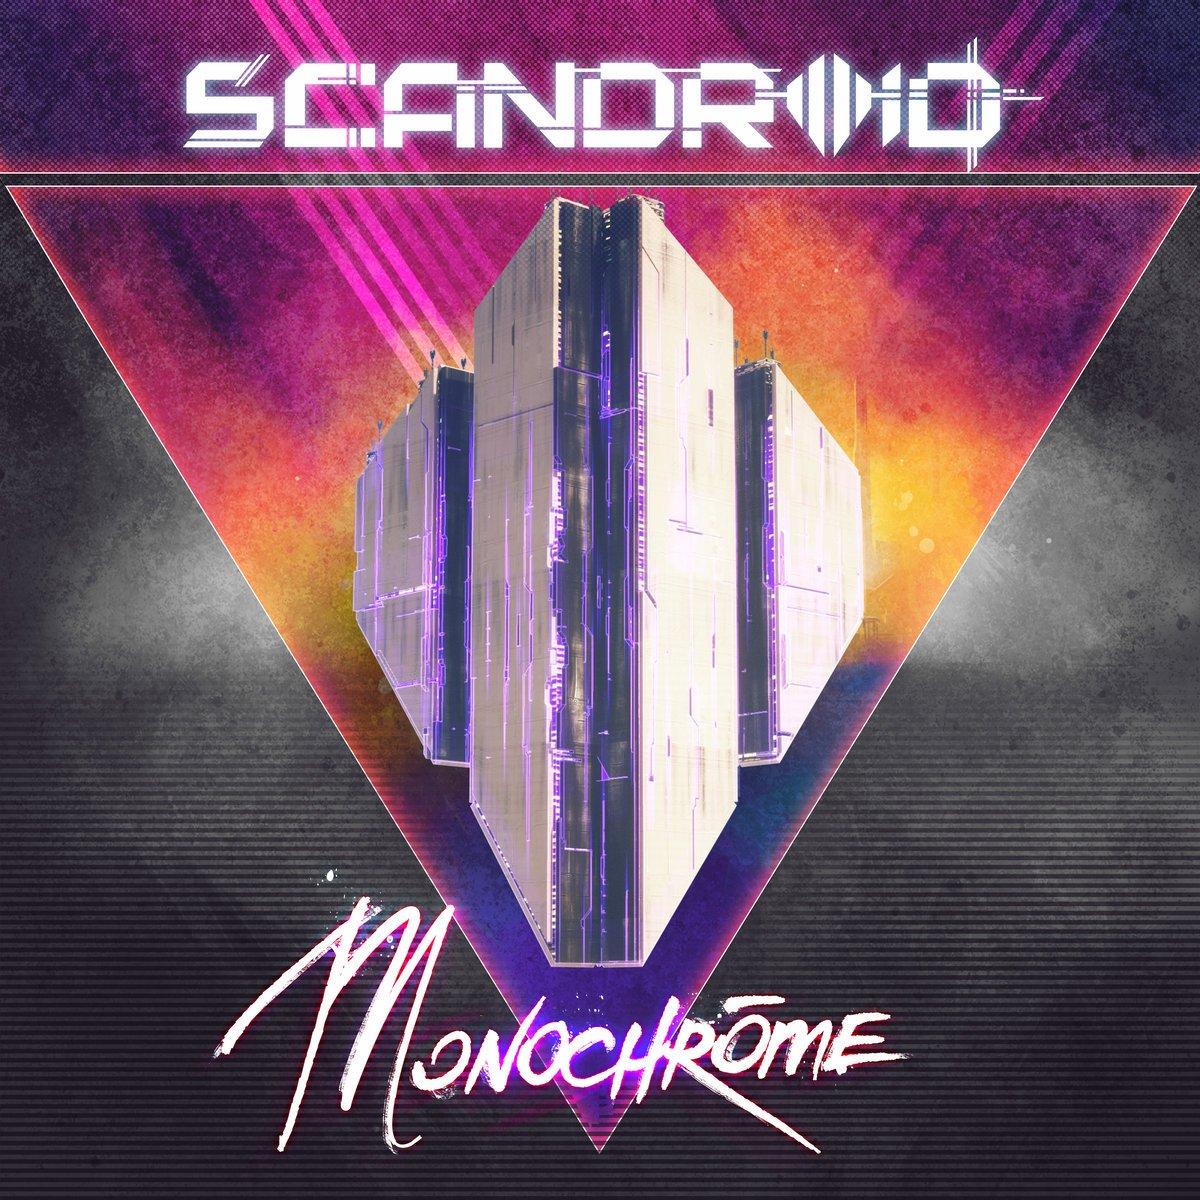 Scandroid. Monochrome format 1212 elite 27 2016